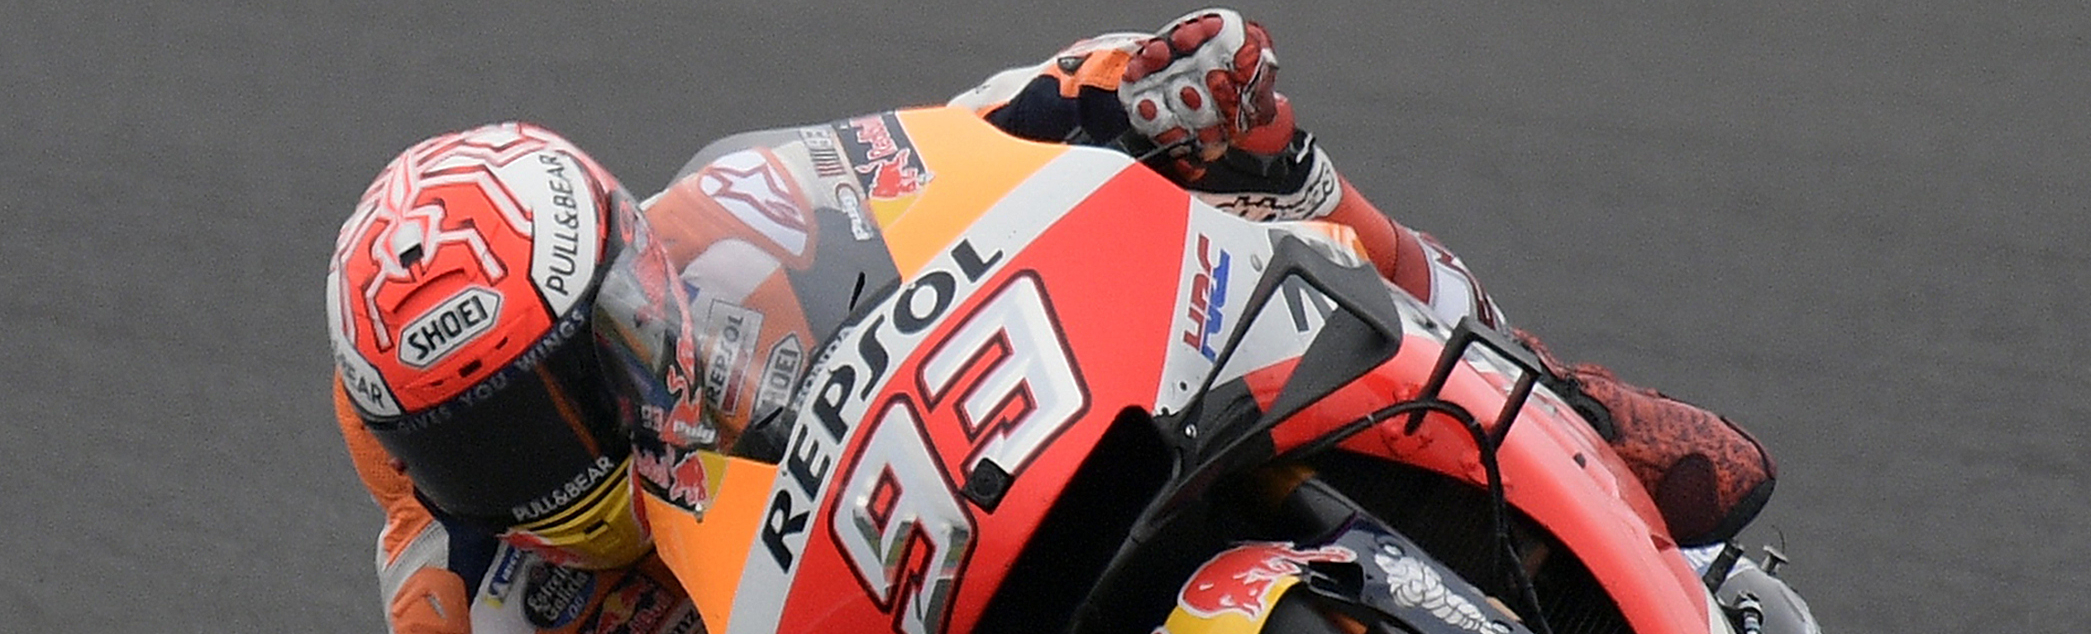 Moto GP: Εξι στα έξι ο Μάρκες!